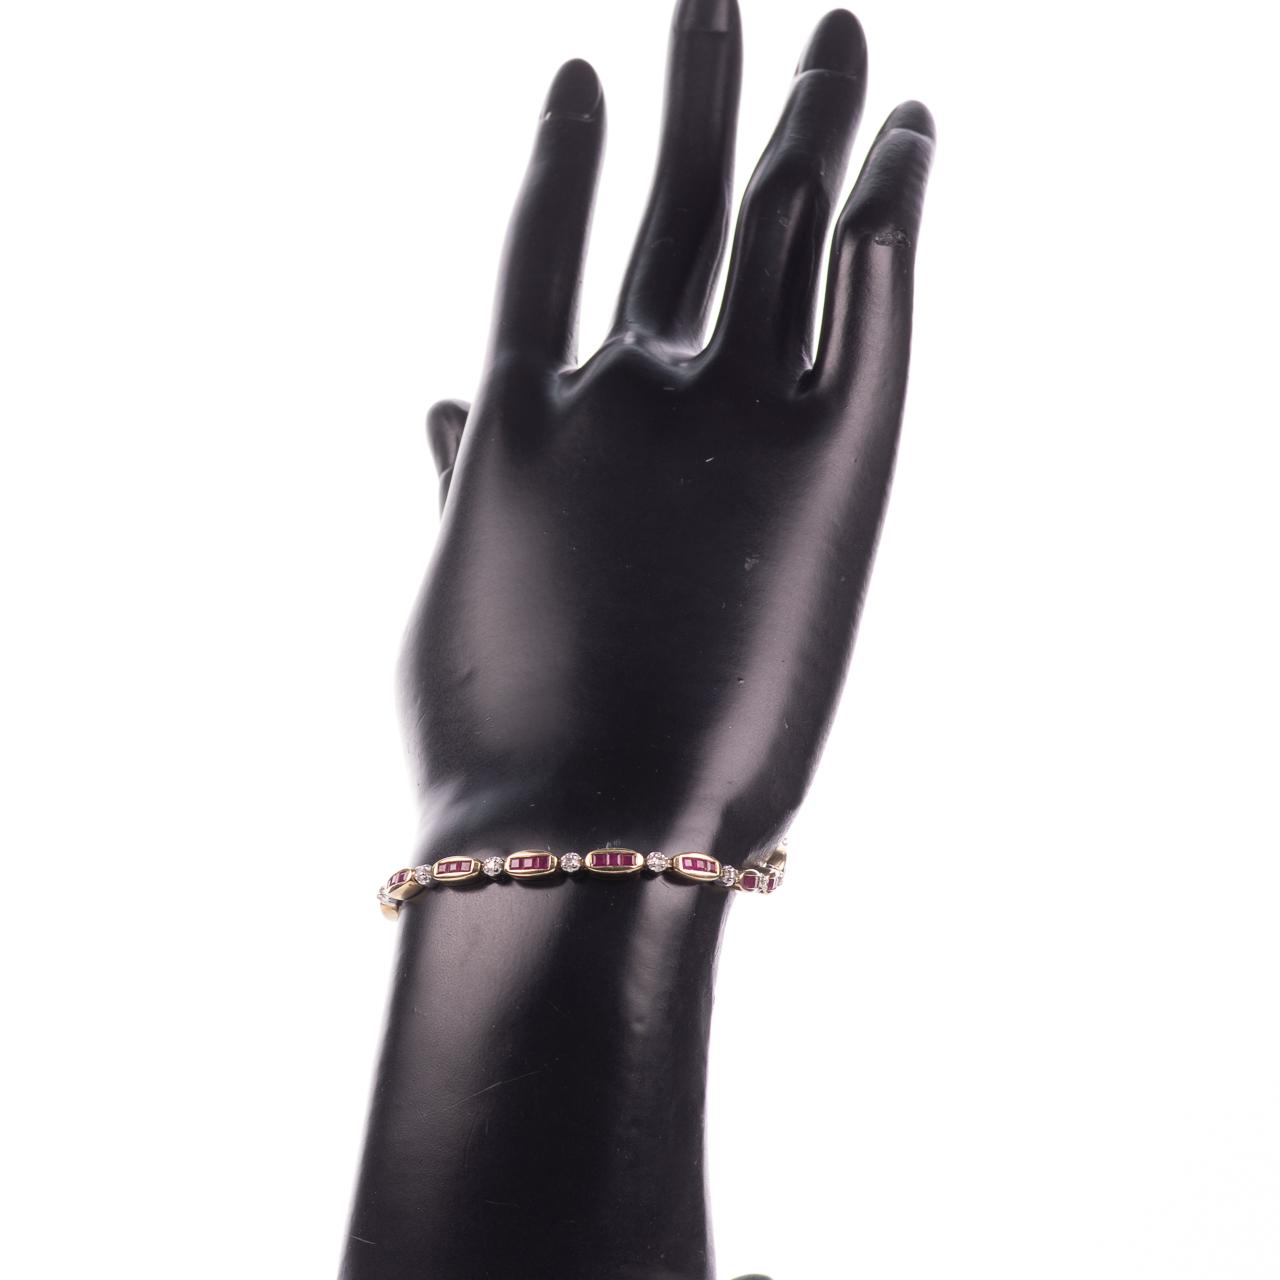 9ct Gold 2ct Ruby & Diamond Tennis Bracelet - Image 2 of 6